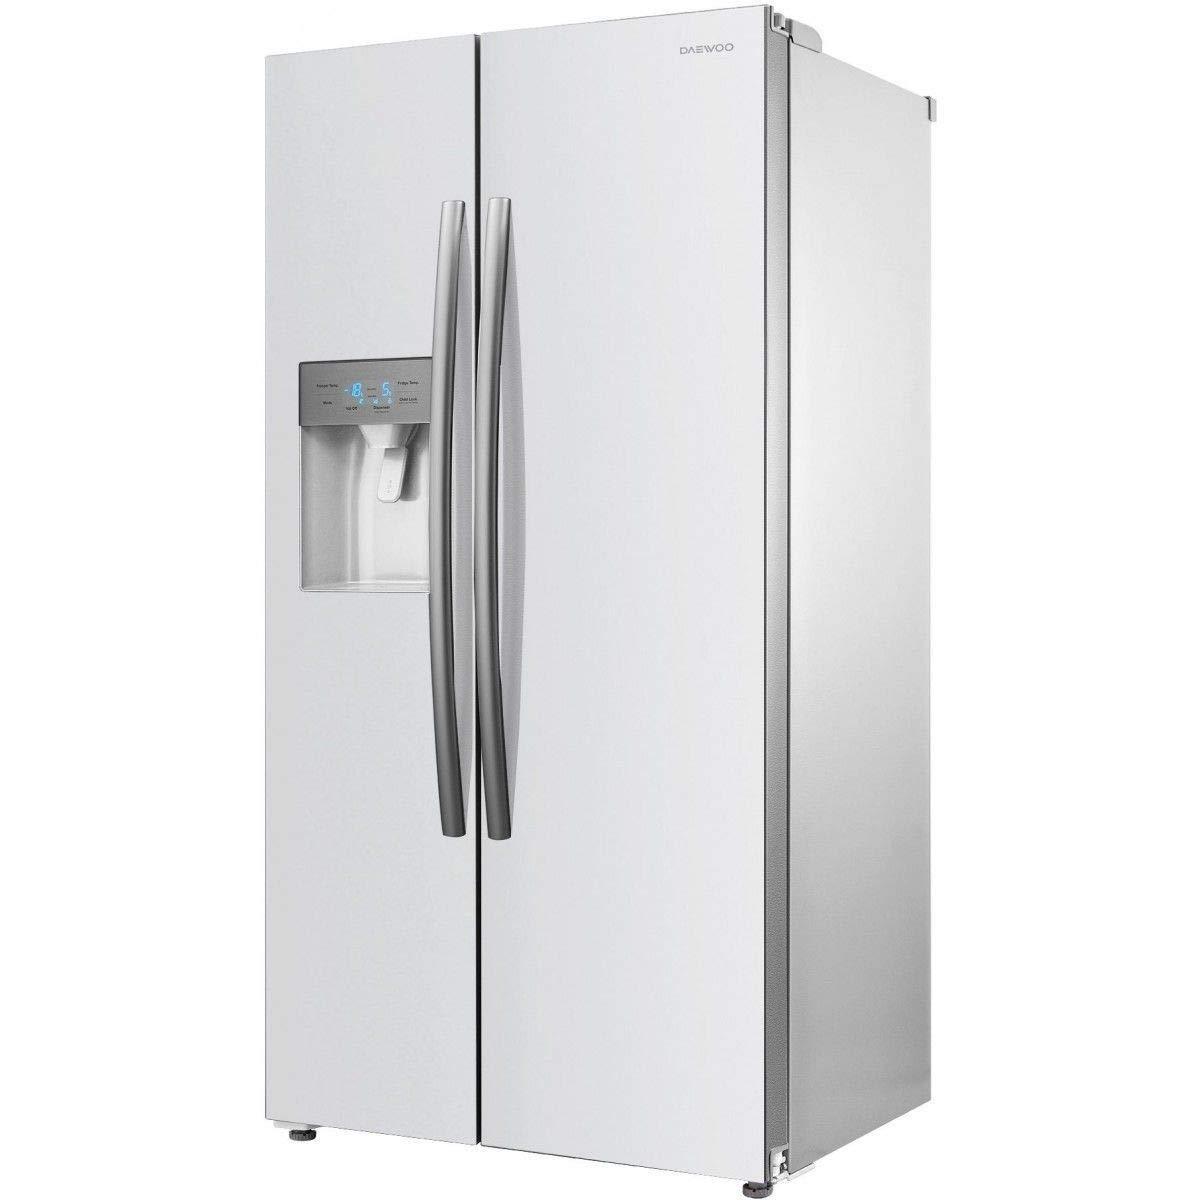 Daewoo FRNM 570 D - Combi para frigorífico (2 W): Amazon.es ...